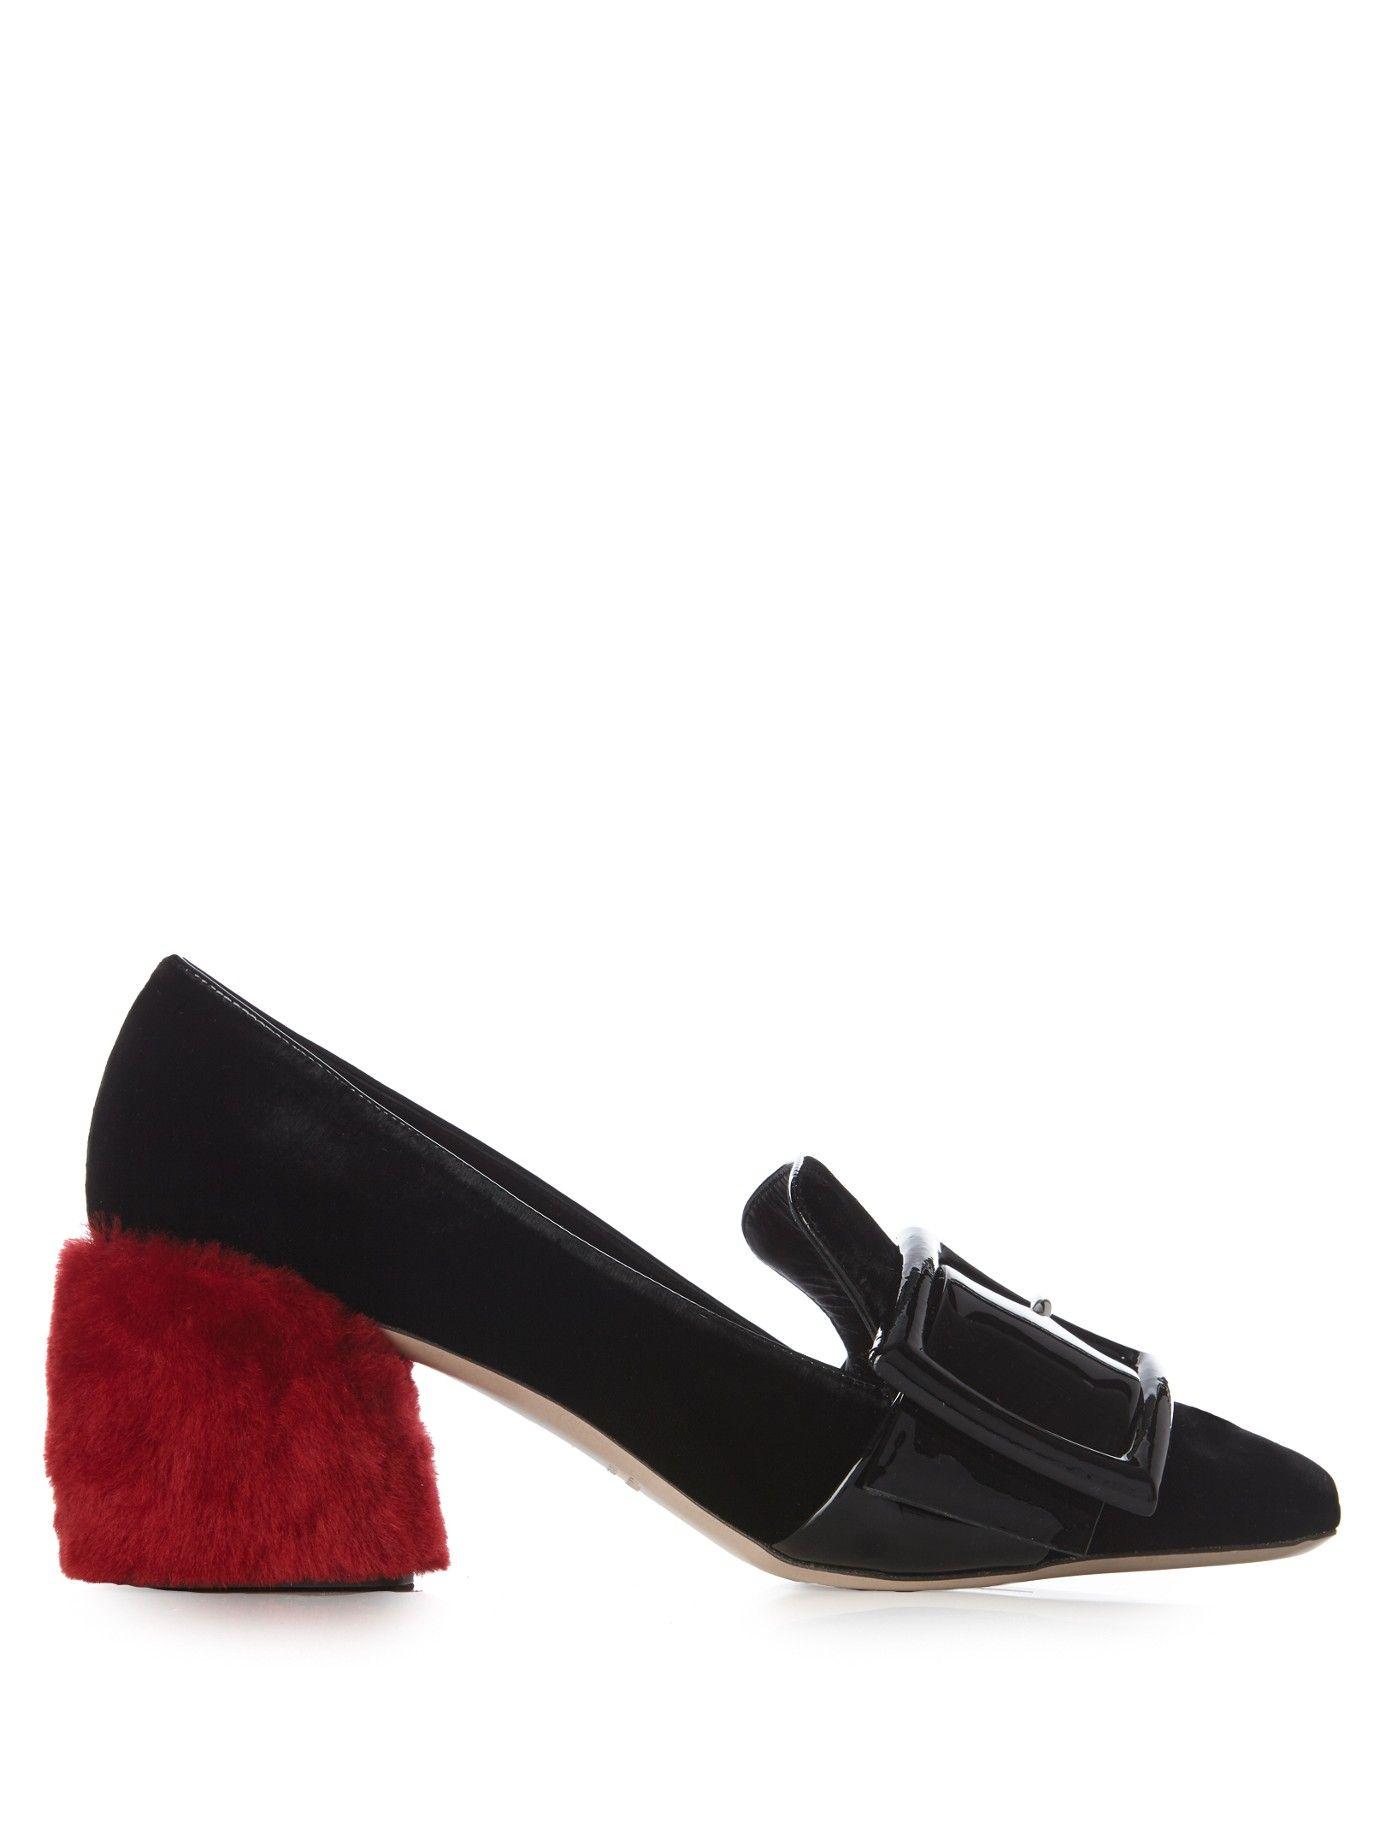 9fe71845143 Fur block-heel velvet loafers | Miu Miu | MATCHESFASHION.COM UK ...